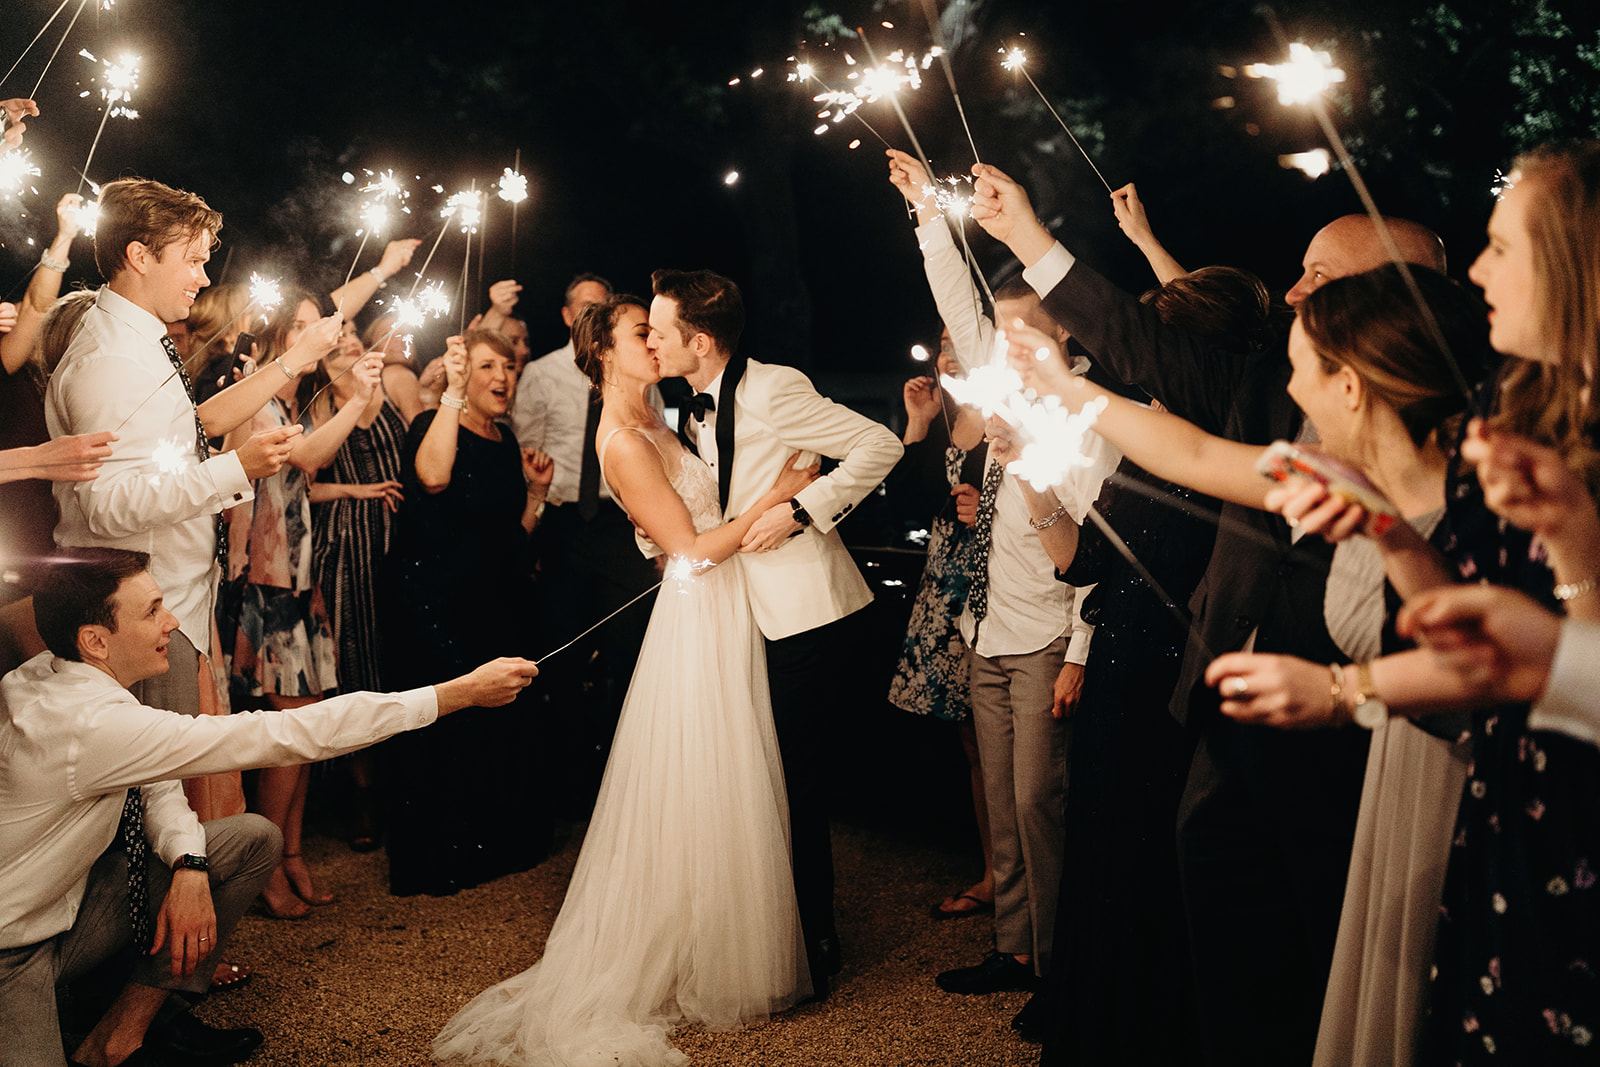 austin-wedding-lindsey-bryce-1035.jpg